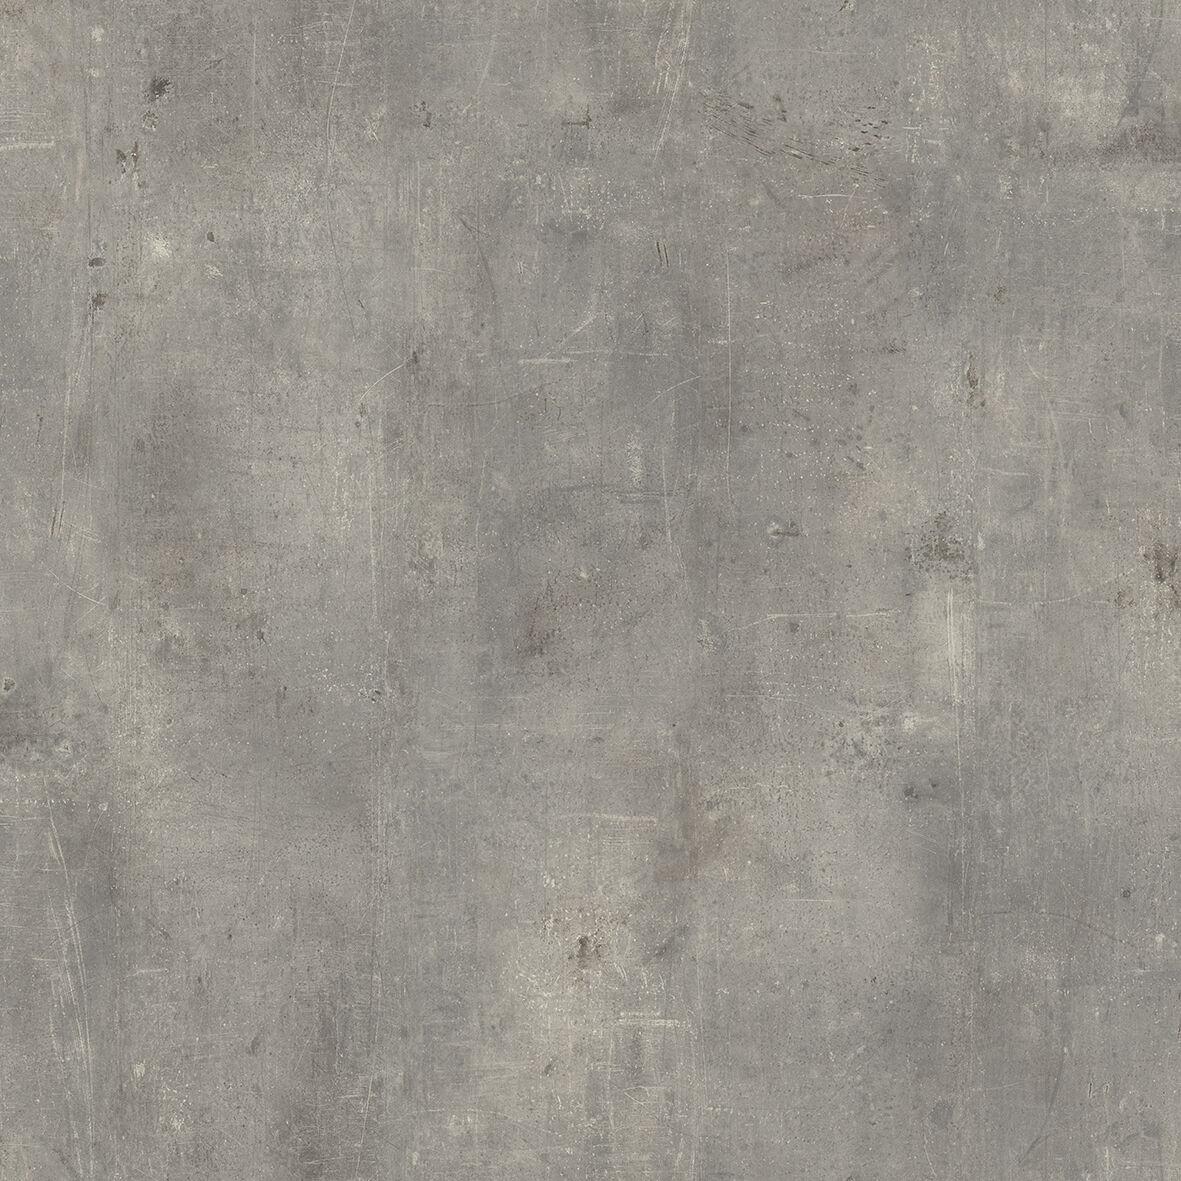 PVC (7€/m²) CV Bodenbelag Atlantic Zink Beton Design 2 Meter breite